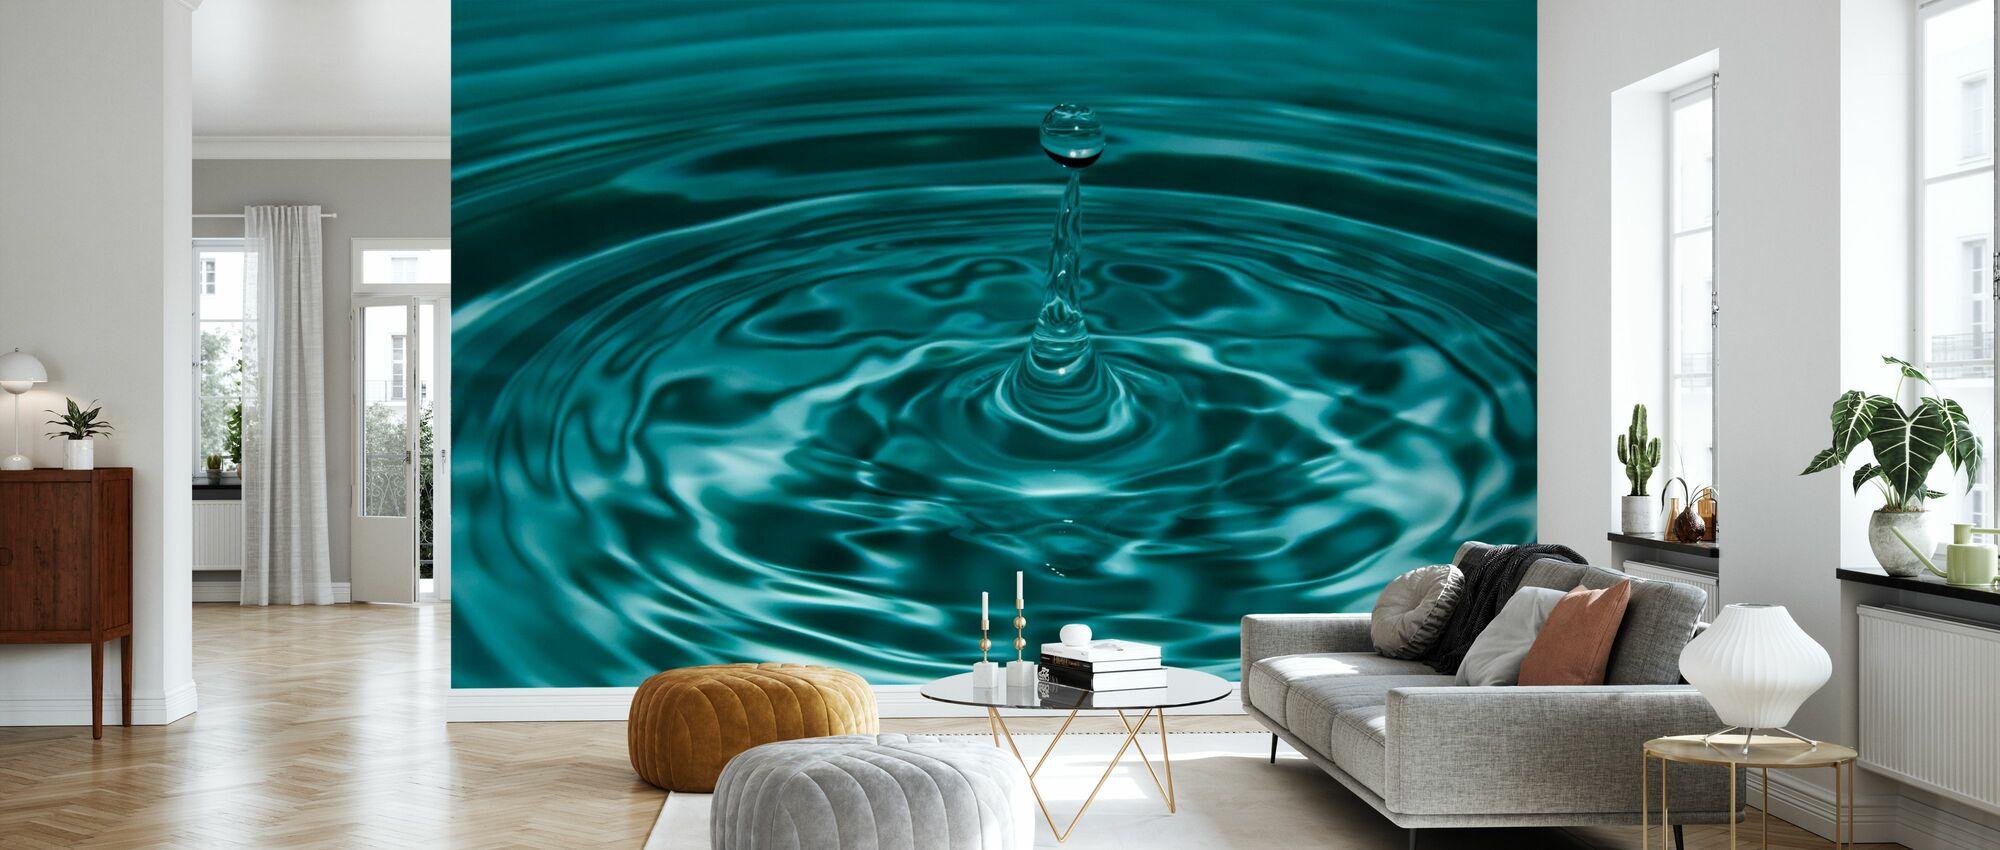 Droplet - Wallpaper - Living Room